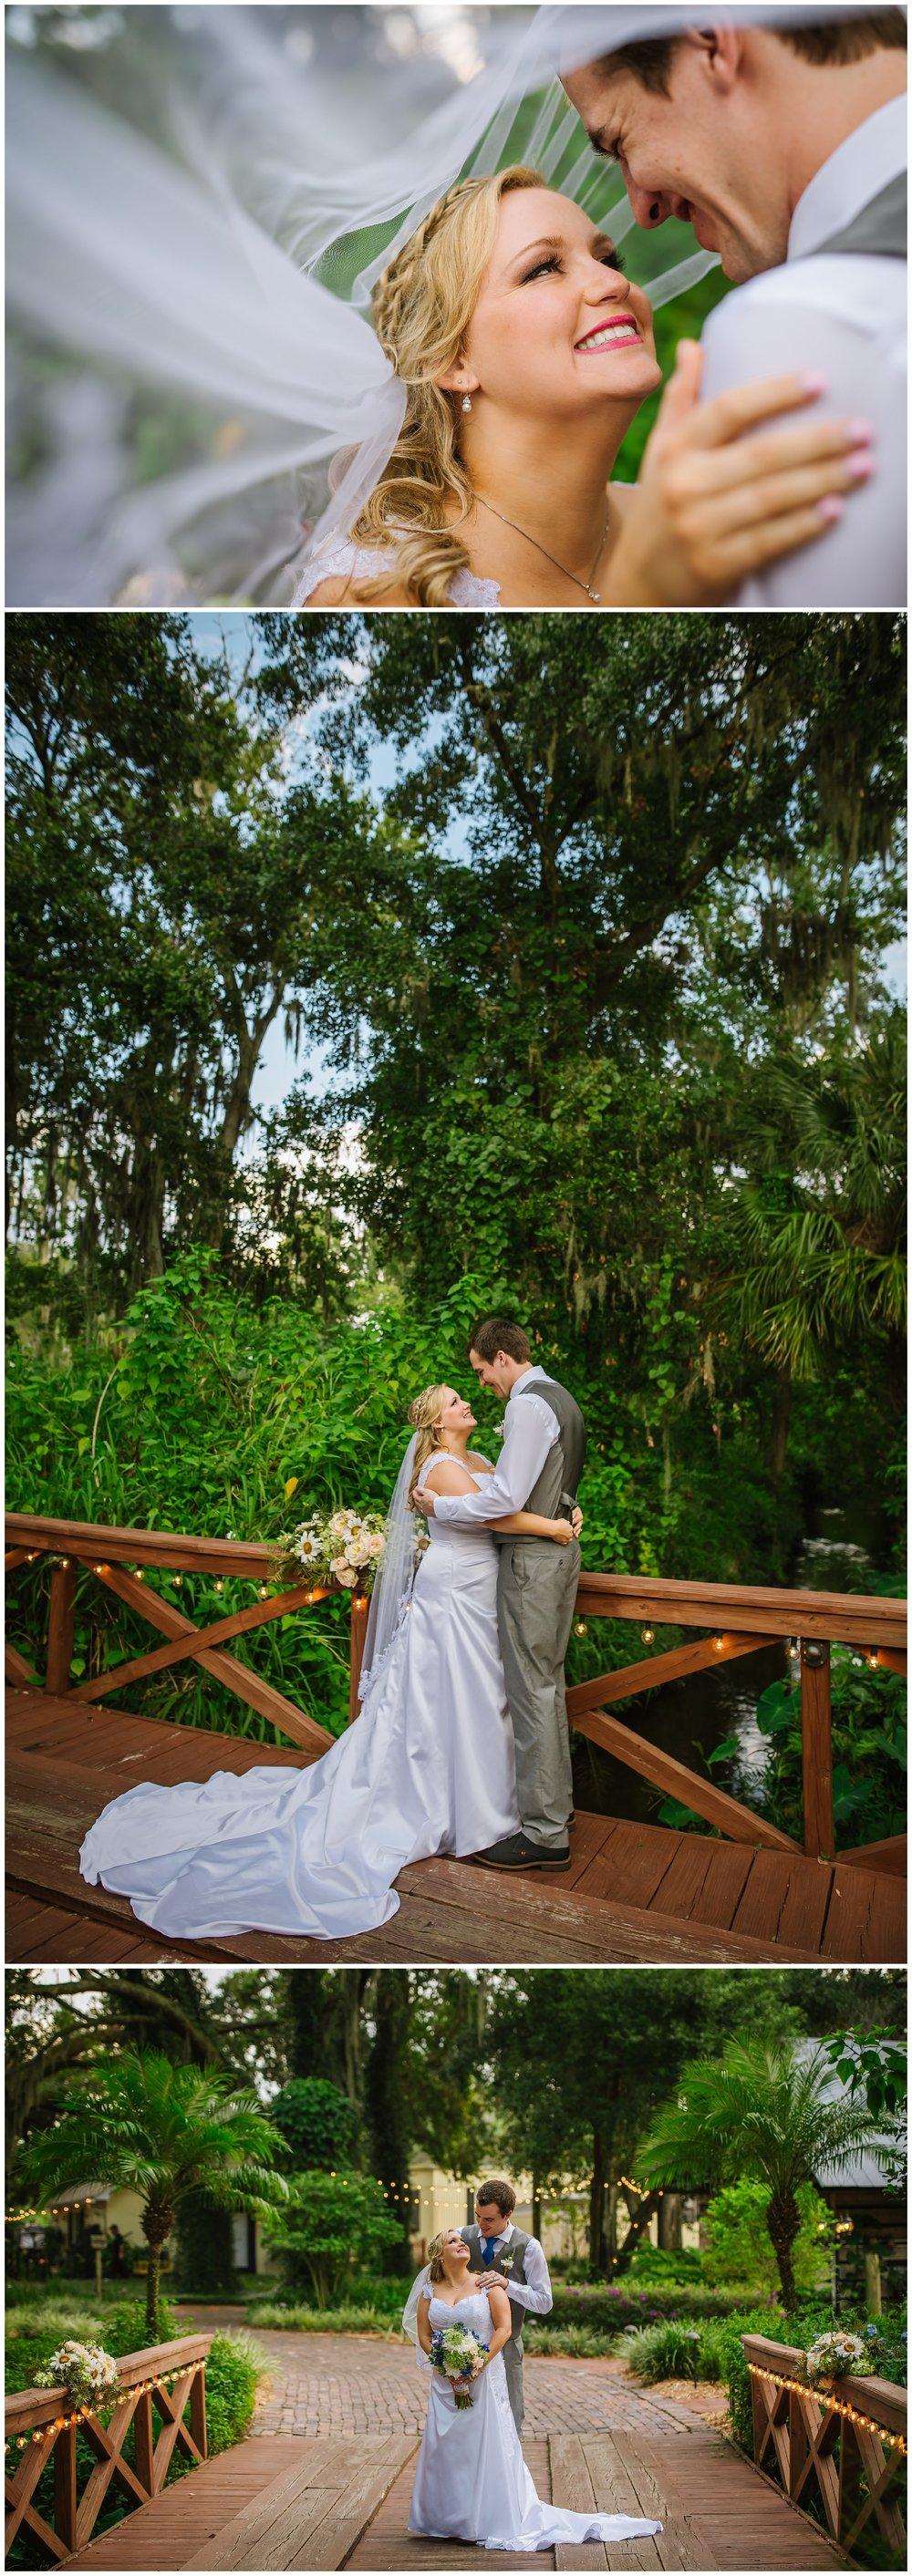 Cross-creek-ranch-navy-bush-tampa-wedding-photogrpaher_0035.jpg